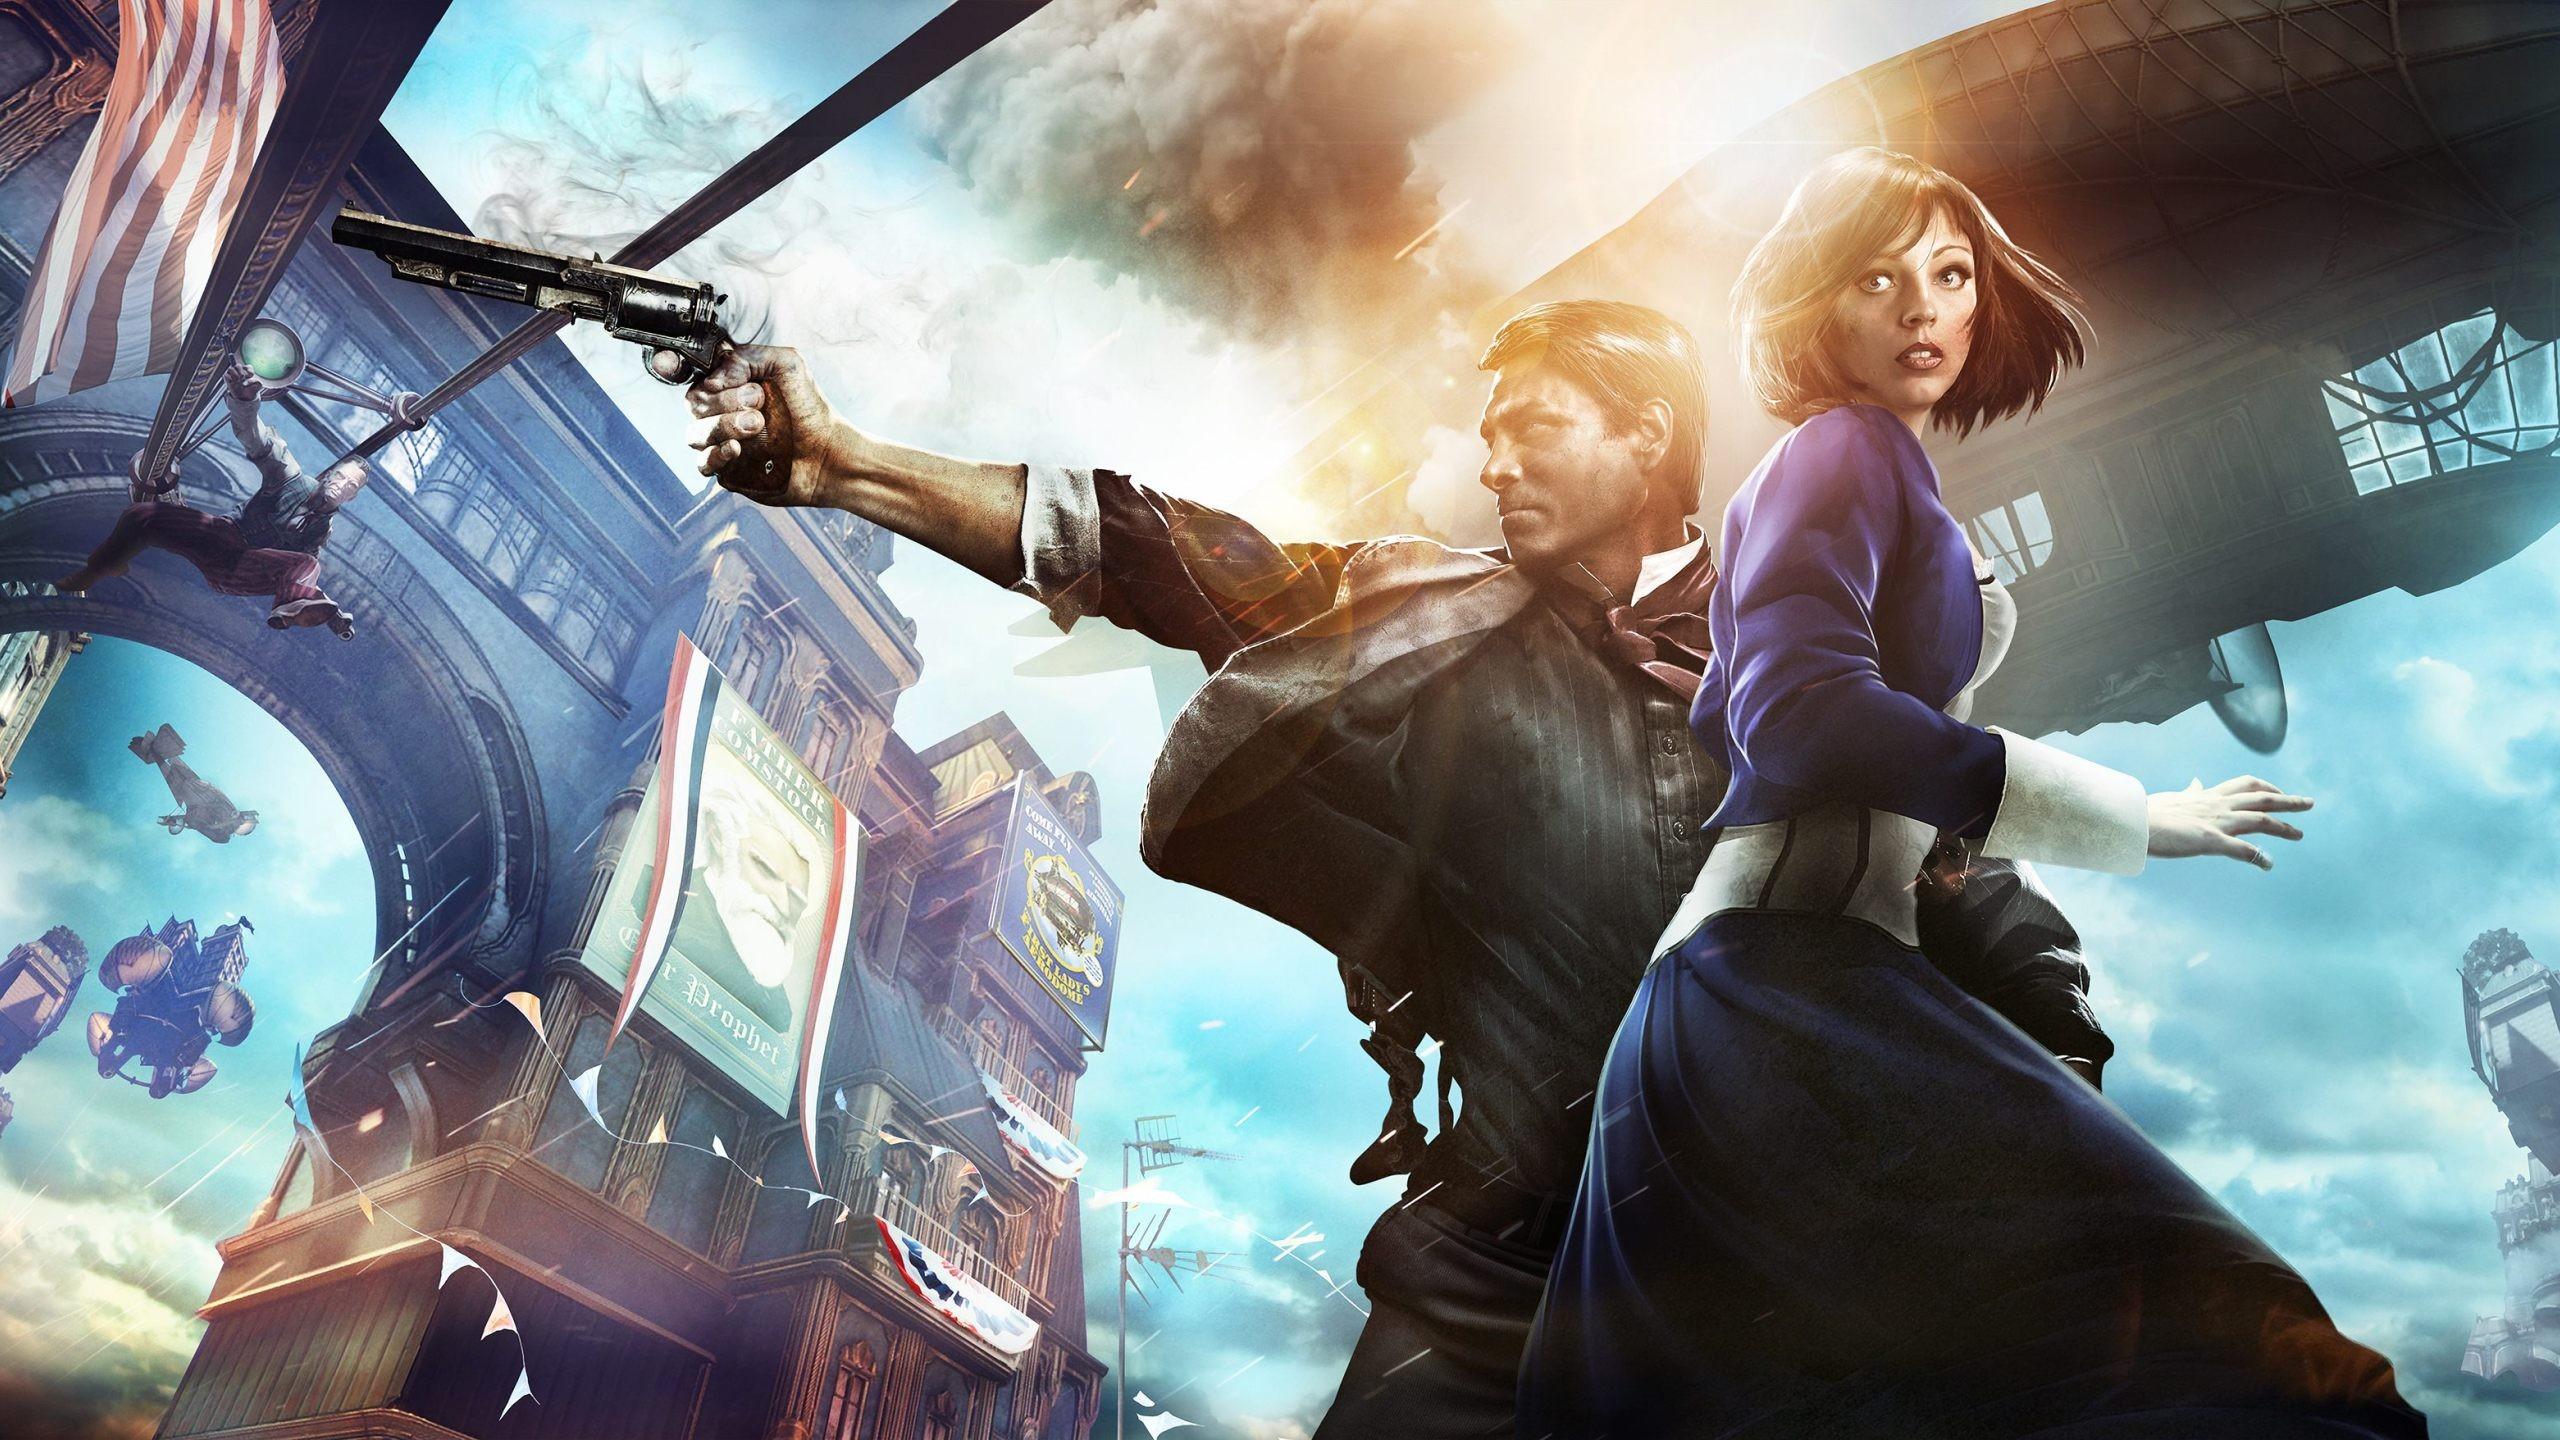 General 2560x1440 BioShock BioShock Infinite video games